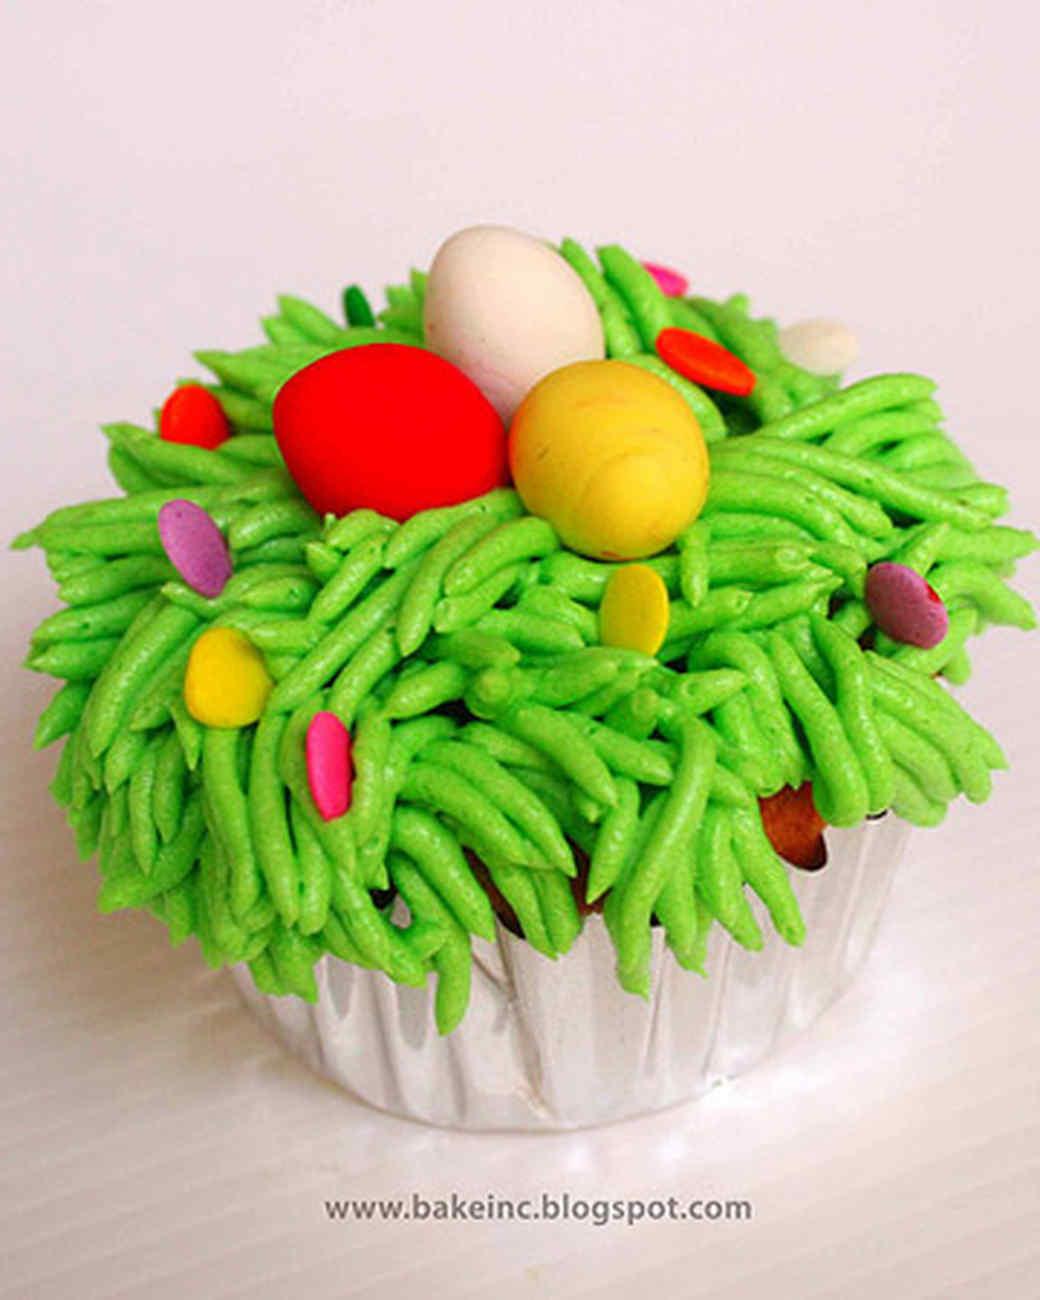 cutestcupcake_09_ori00091563.jpg